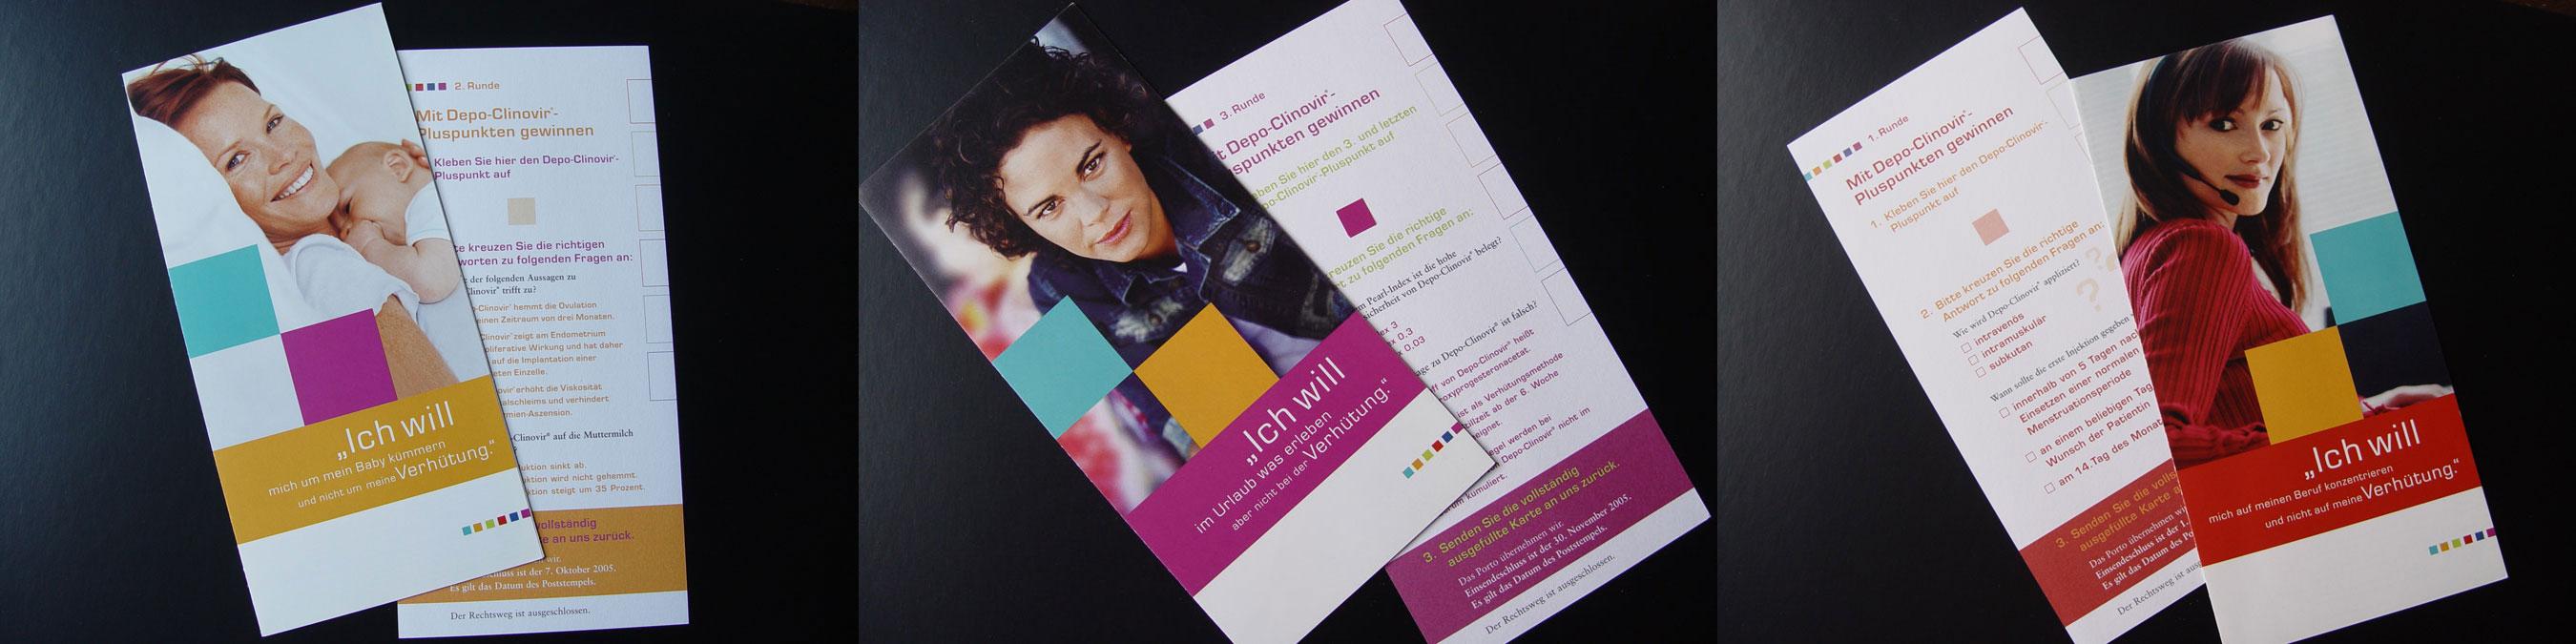 Professionelle Artzansprache - Mailingkampagne DEPO Cinovir